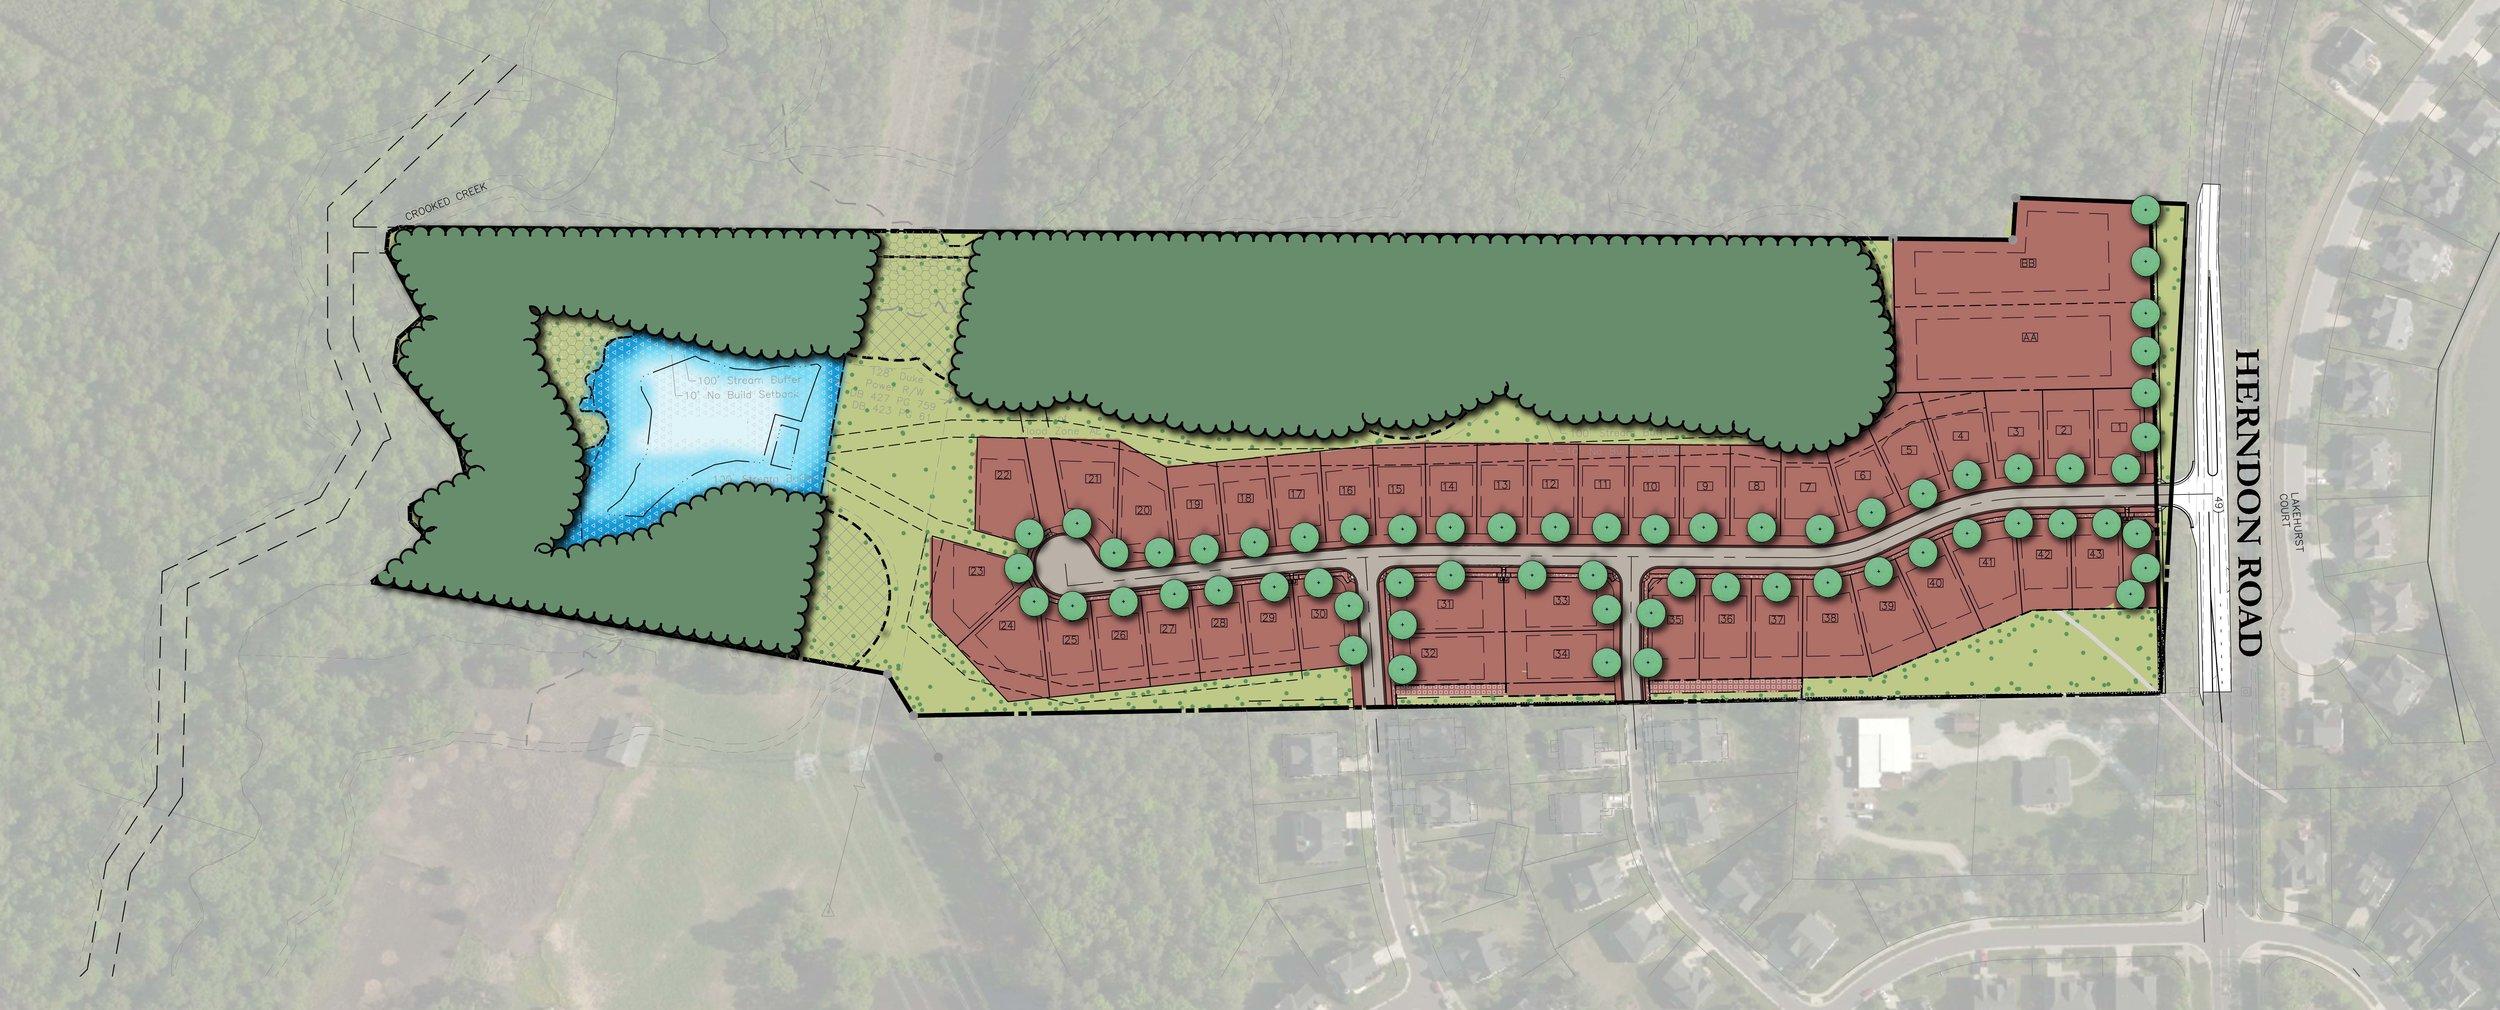 Herndon Trace - Land Planning